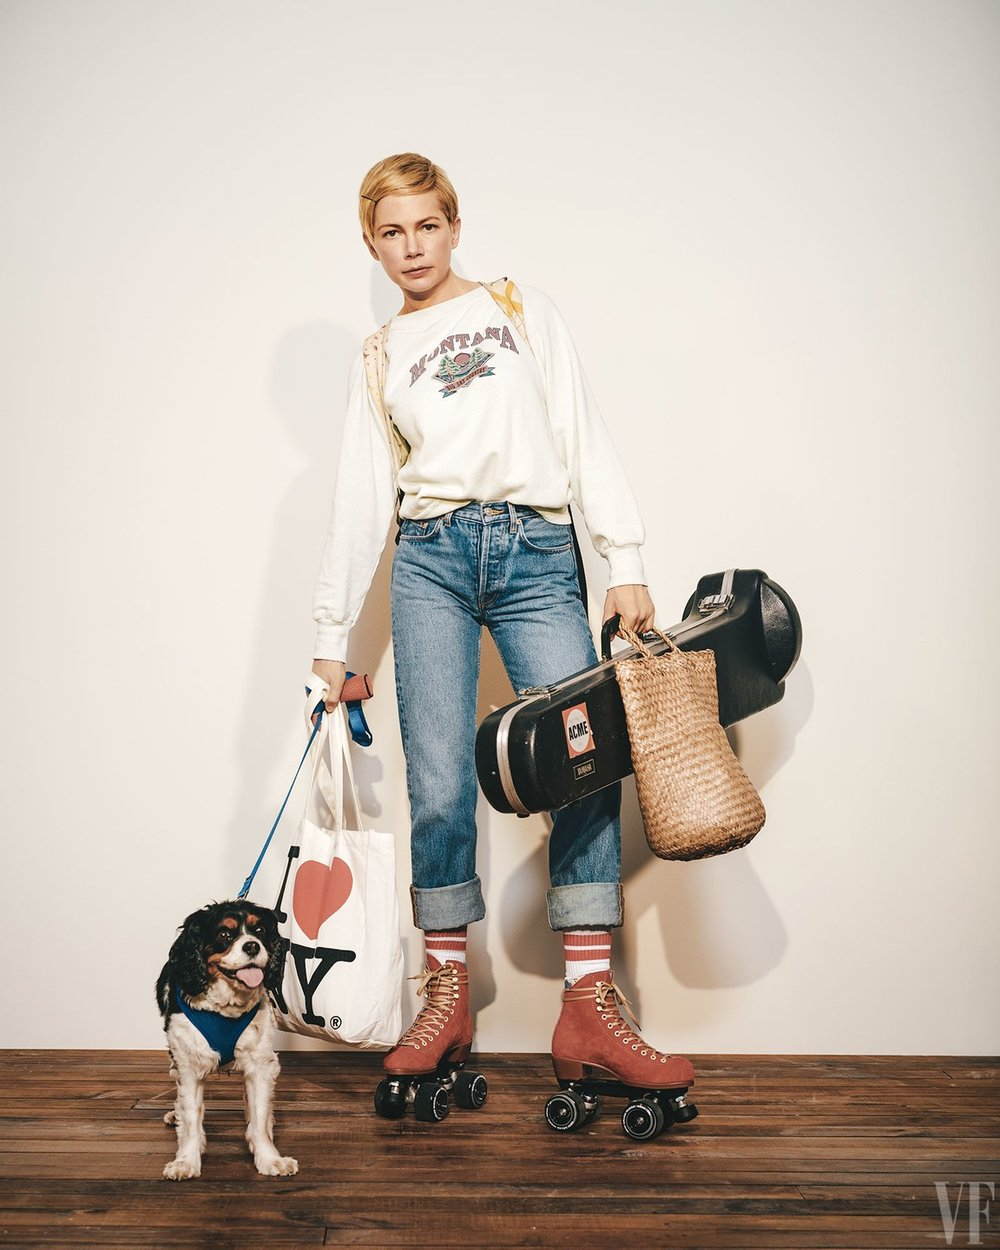 Michelle Williams by Collier Schorr for Vanity Fair Sept 2018 (7).jpg